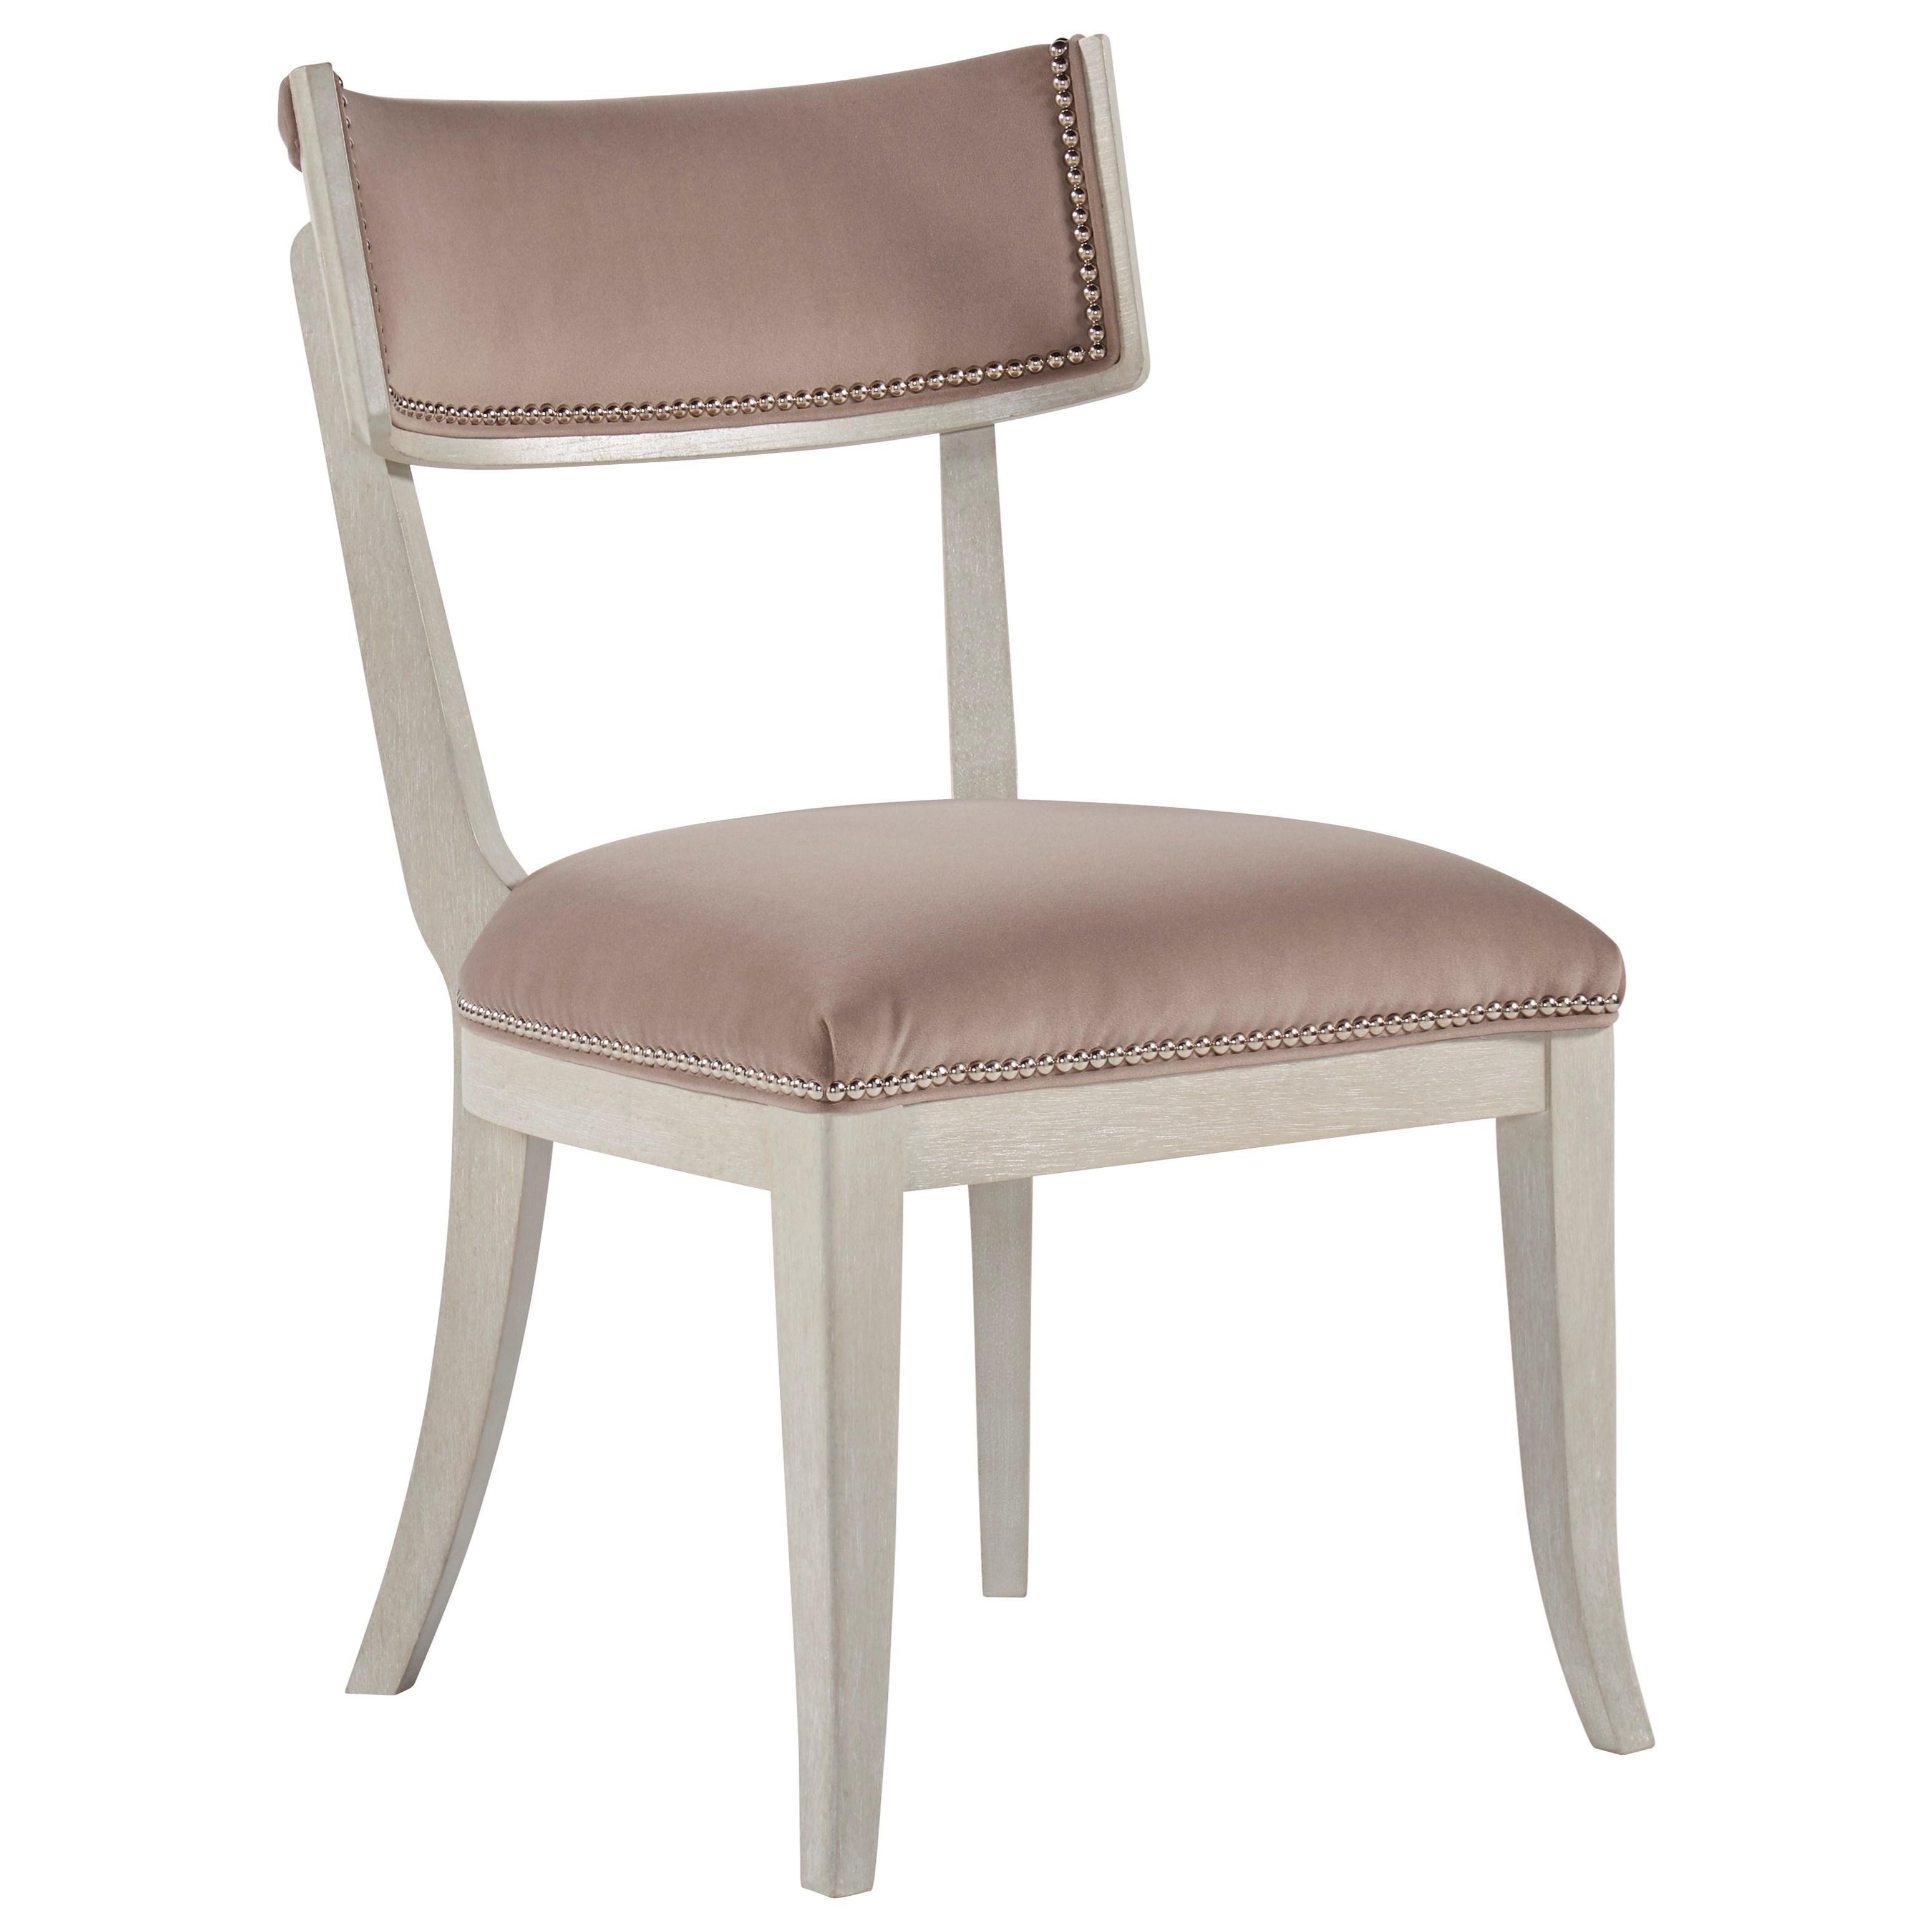 La Scala Dining Side Chair by Klien Furniture at Sprintz Furniture